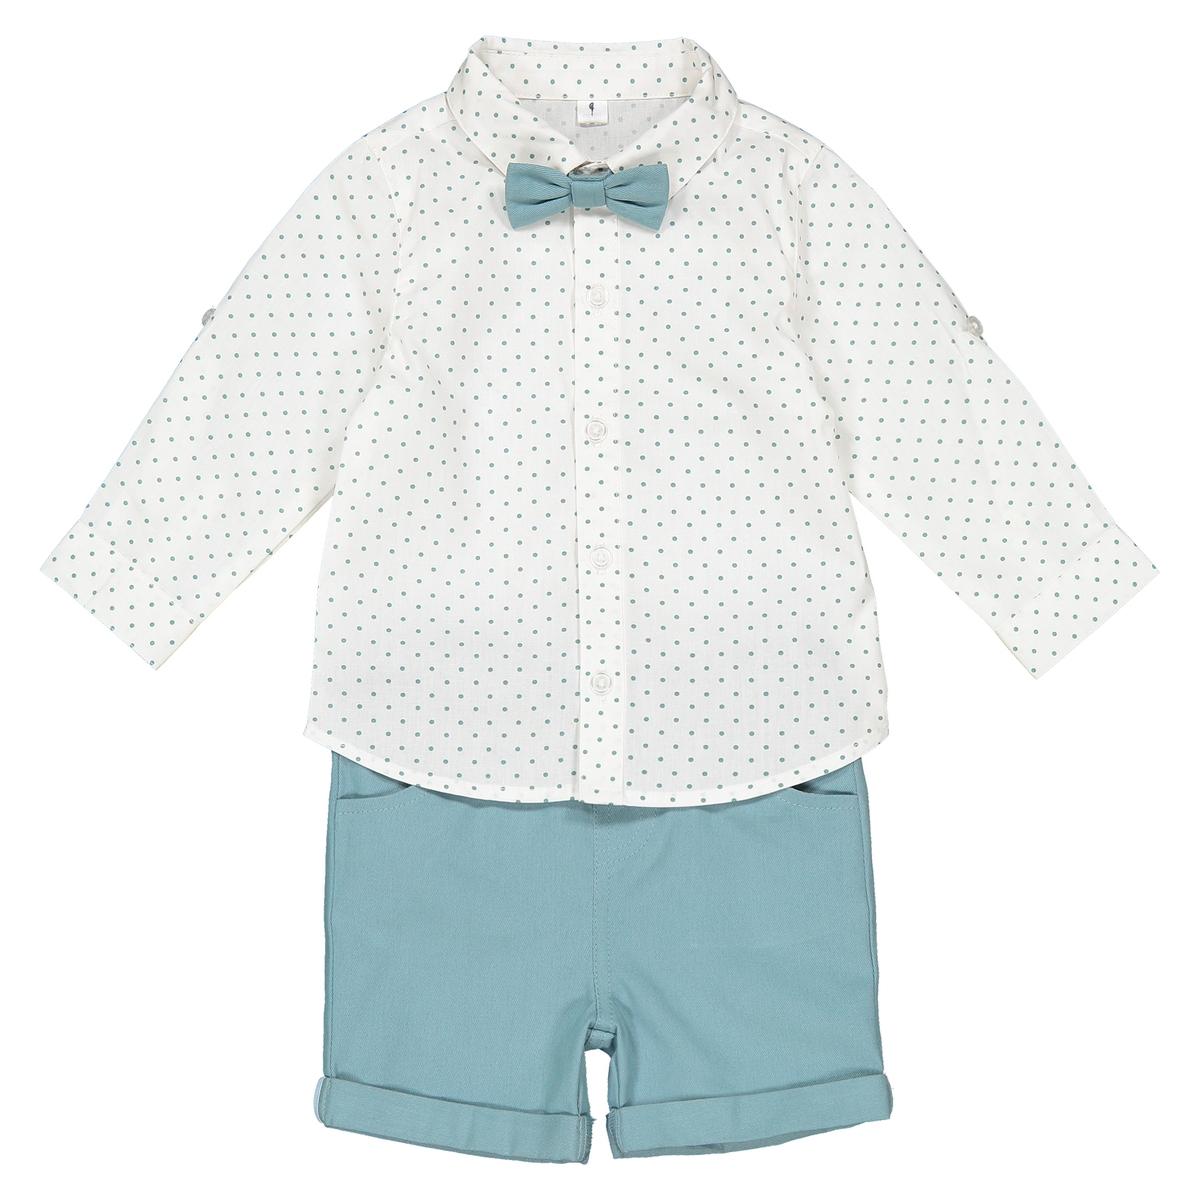 Фото - Комплект бермуды рубашка бантик LaRedoute 3 мес - 3 лет 3 года - 94 см синий юбка laredoute прямая из легкого денима 3 12 лет 3 года 94 см синий